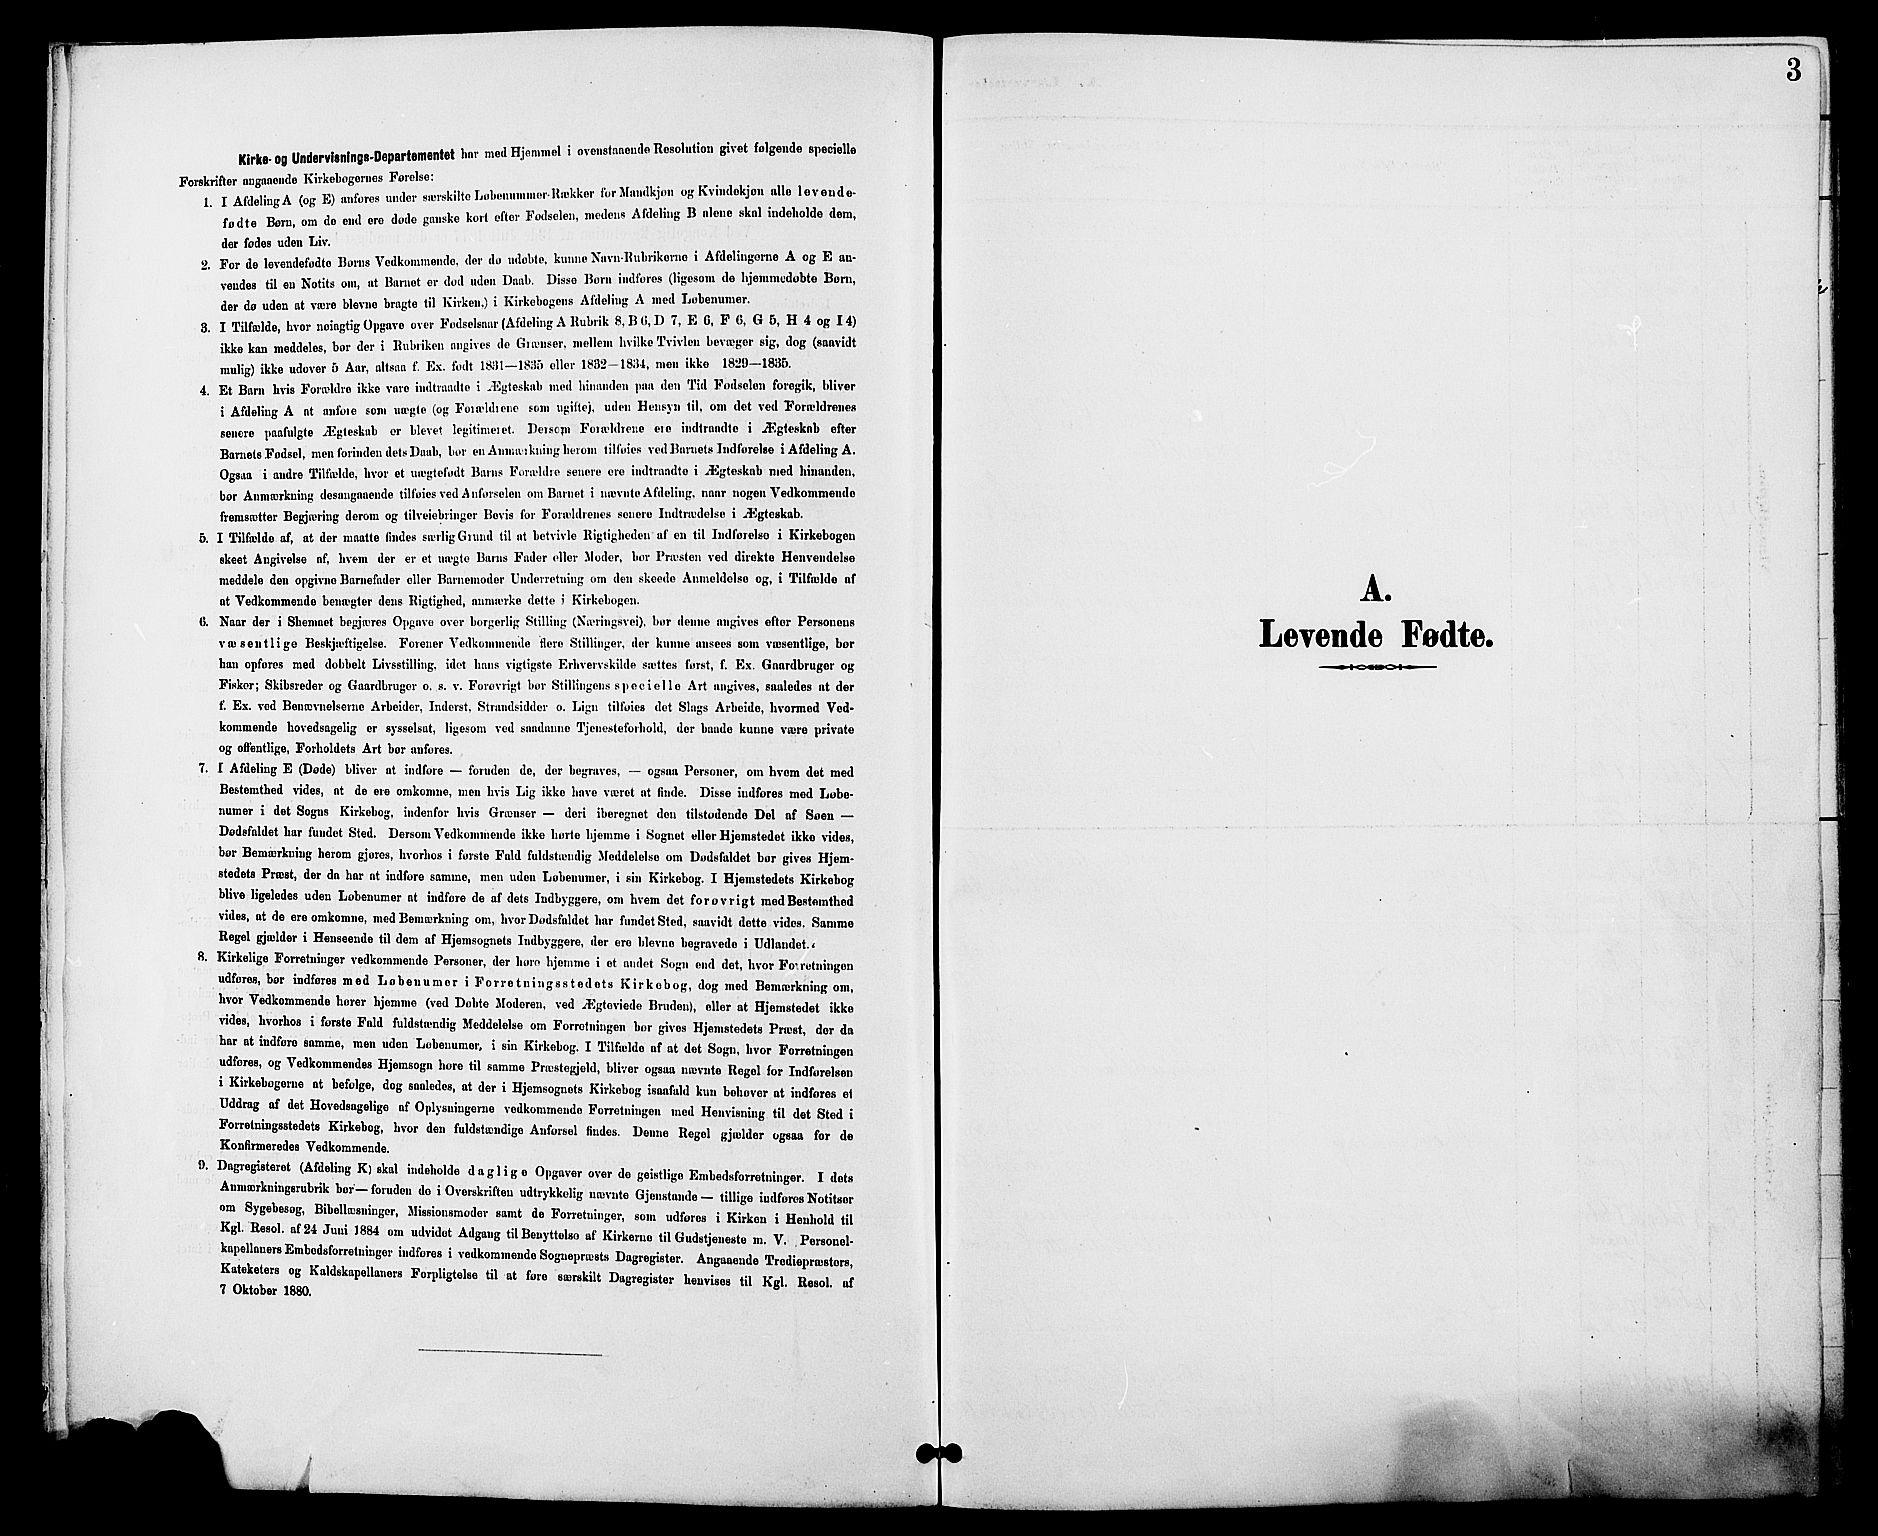 SAH, Biri prestekontor, Ministerialbok nr. 7, 1887-1893, s. 3